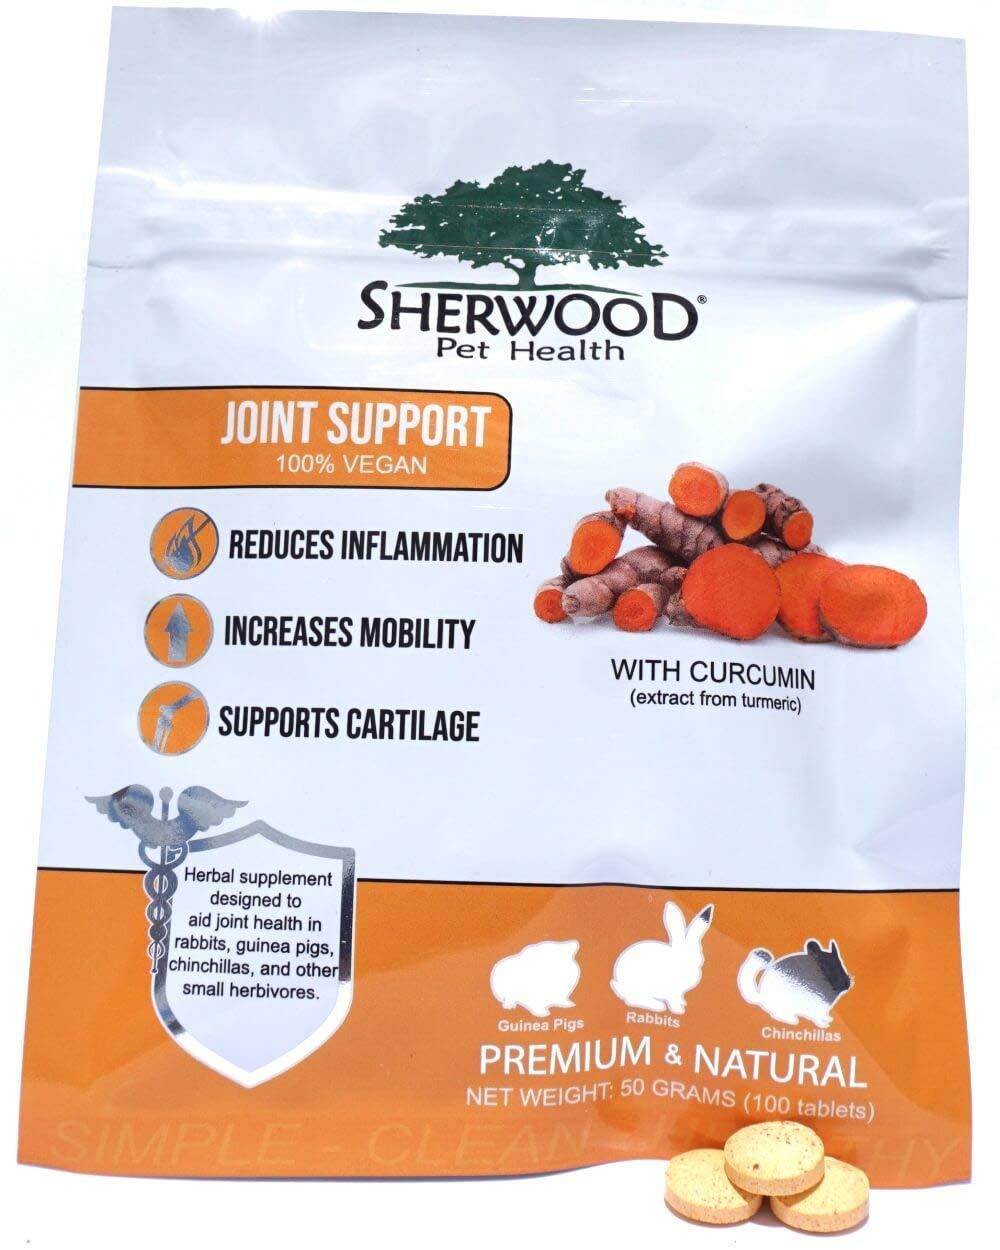 Sherwood Pet Health Vegan Joint Support (100 Tablets - 50 Grams)